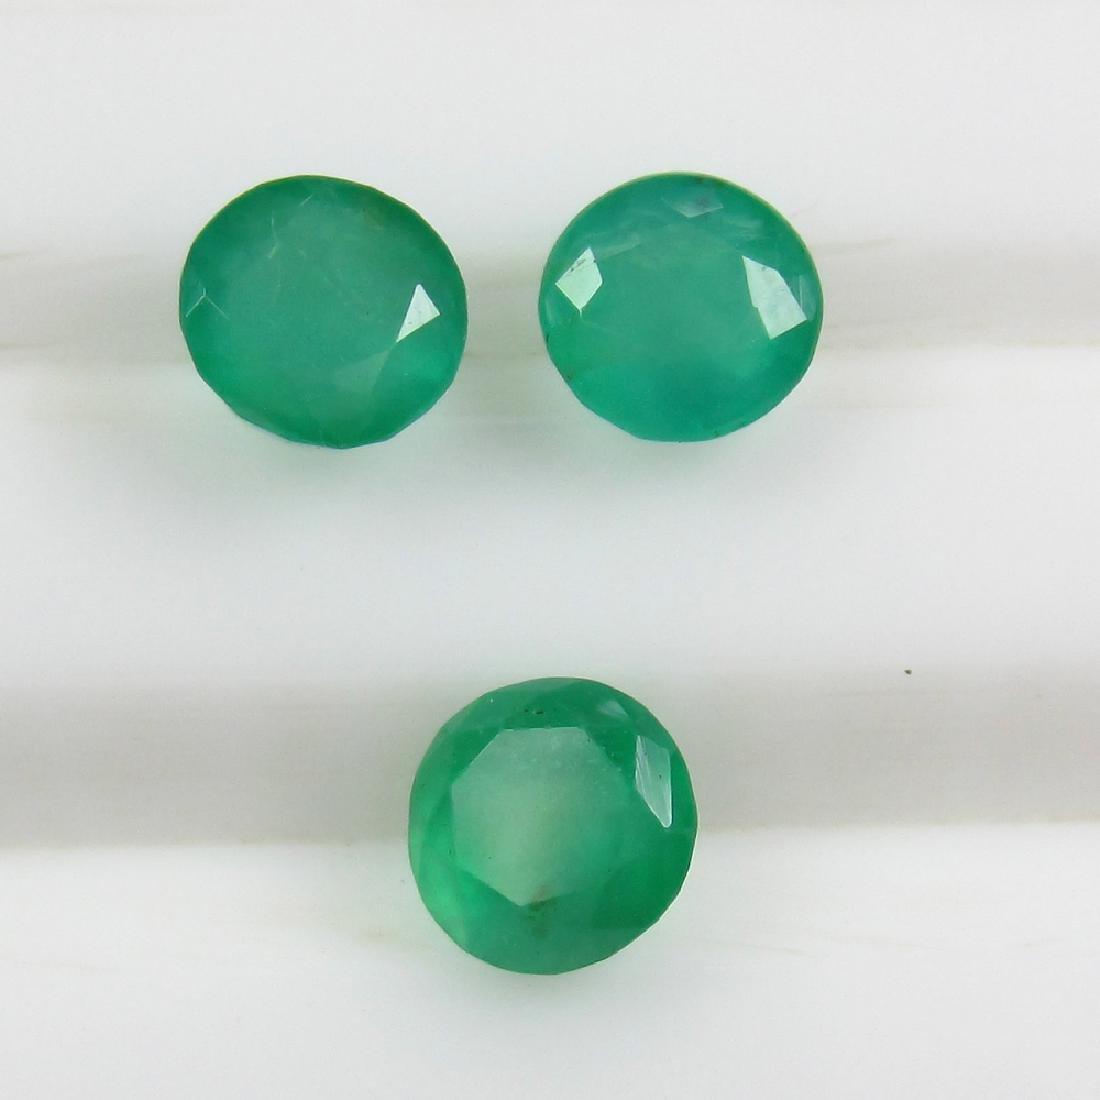 1.36 Ct Genuine Zambian Emerald 4.2 mm Matching Round